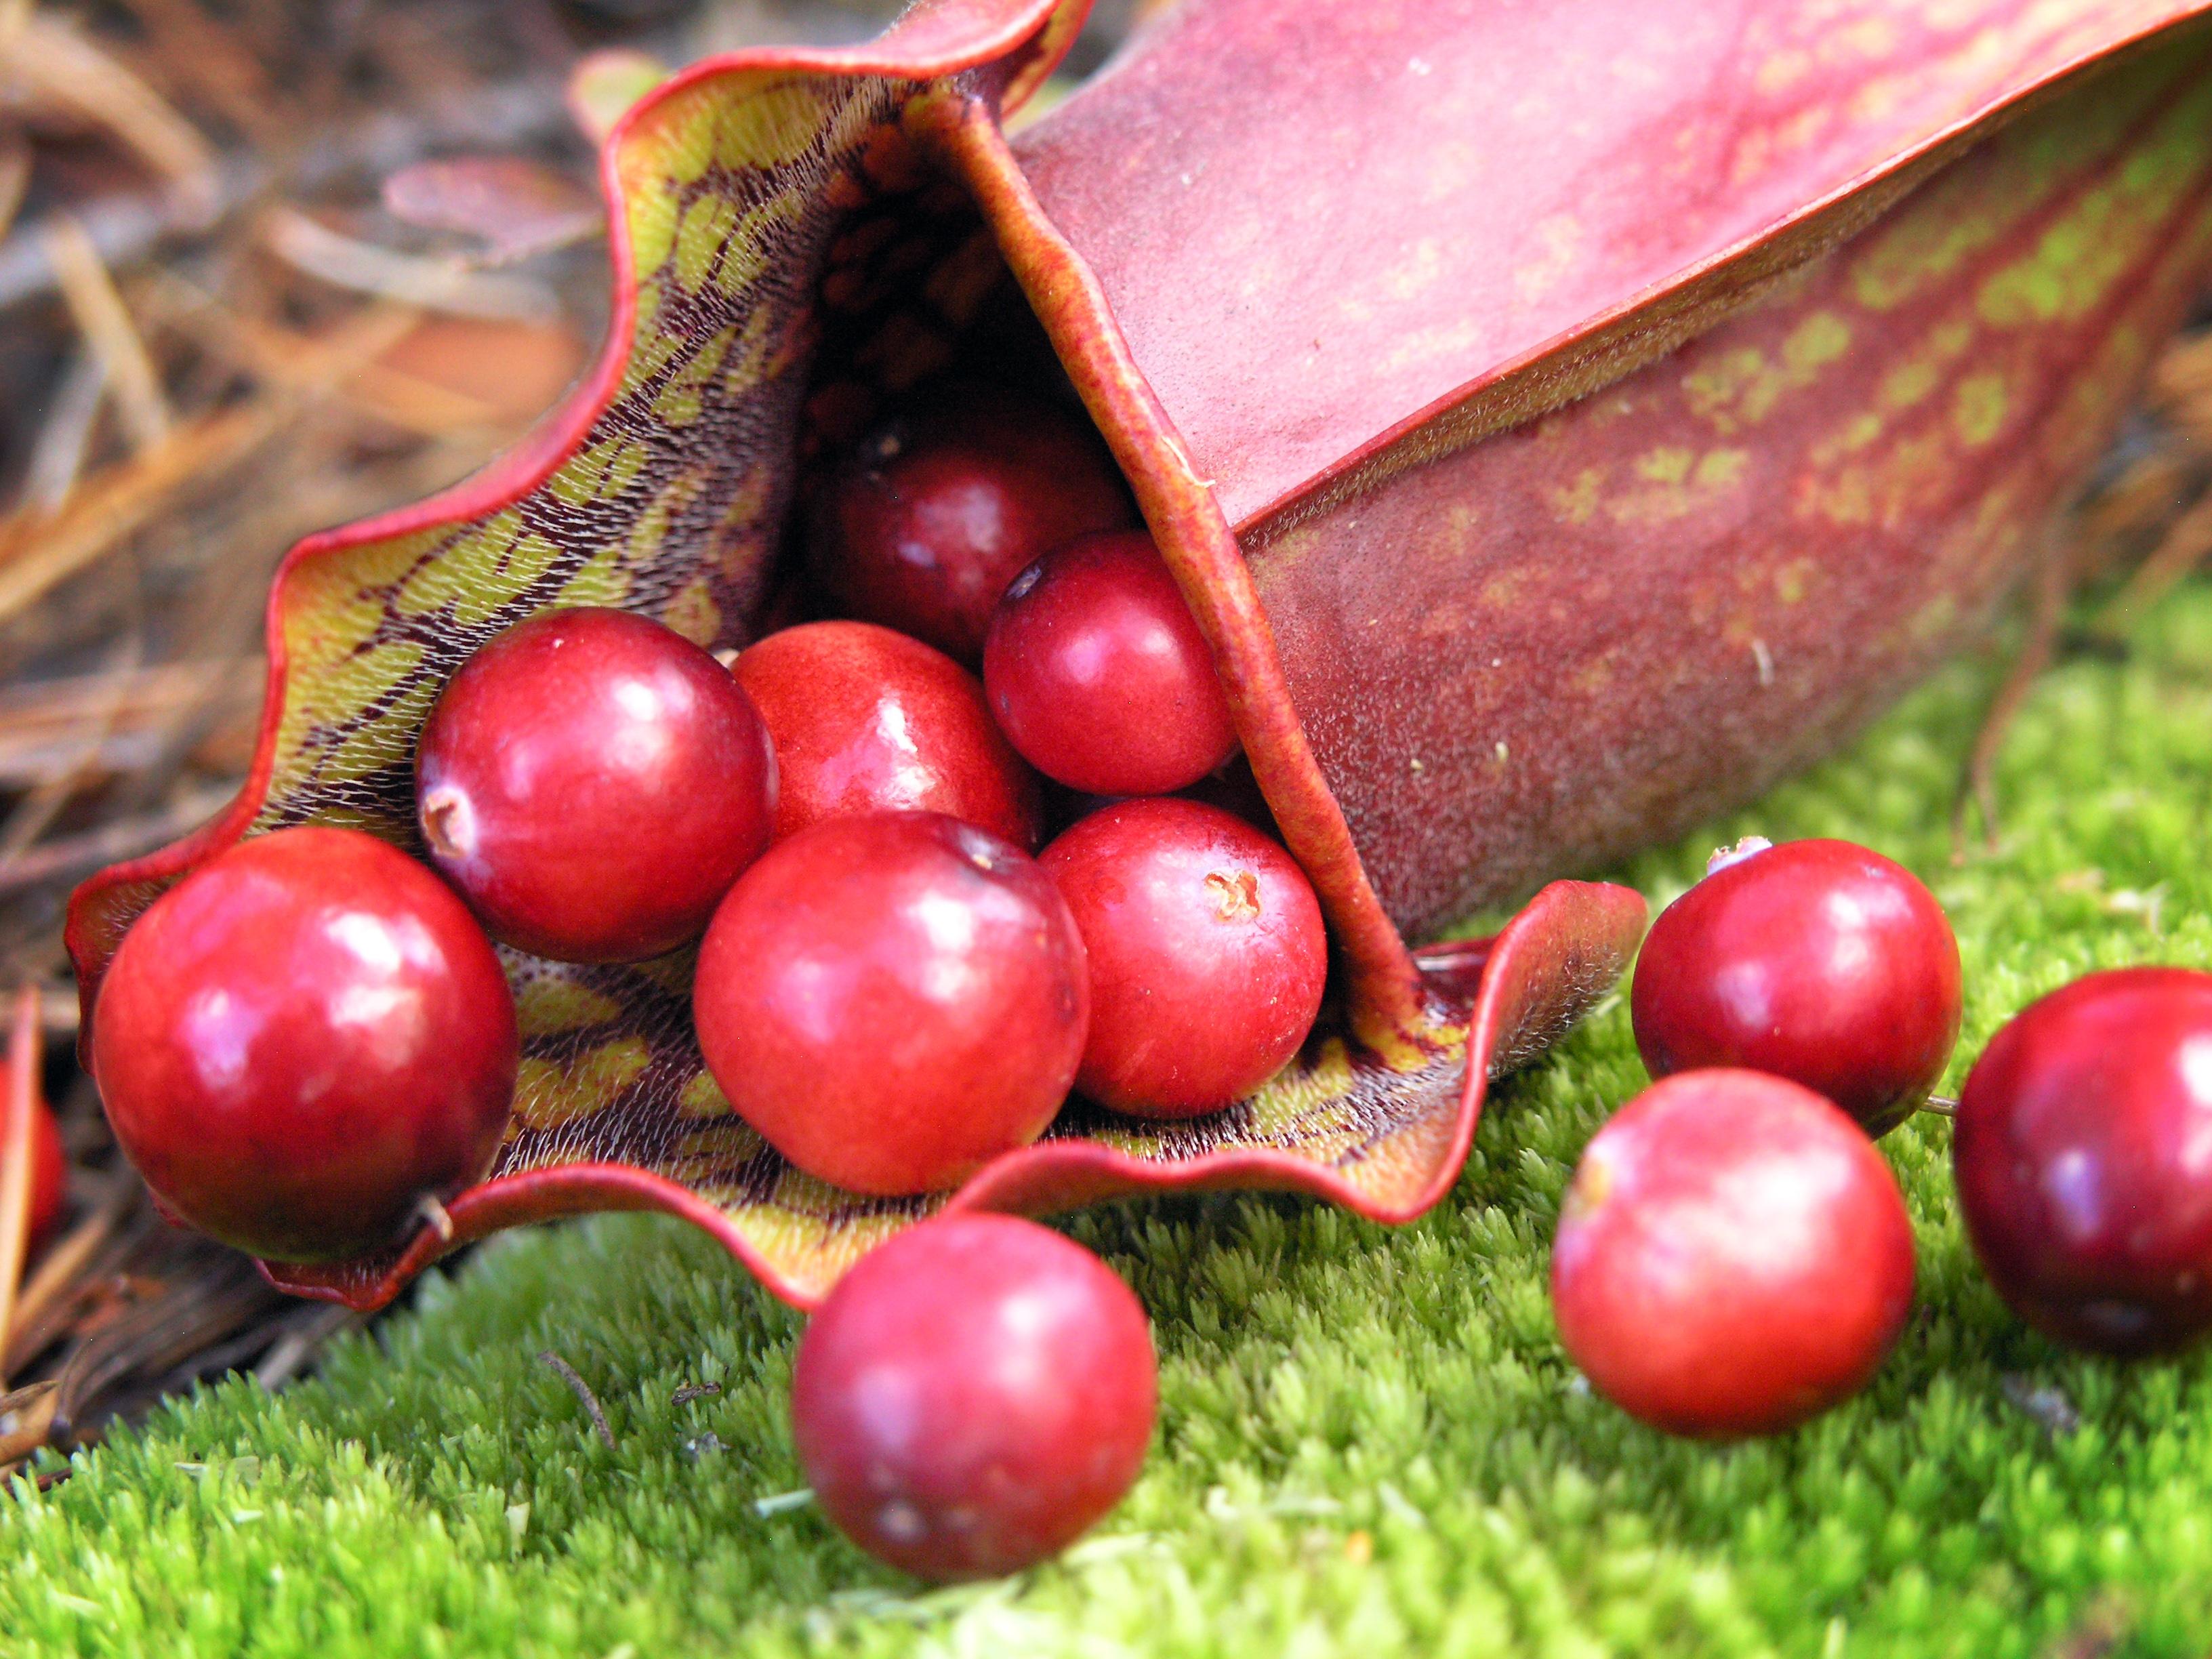 Highbush Cranberries by Blondieyooper